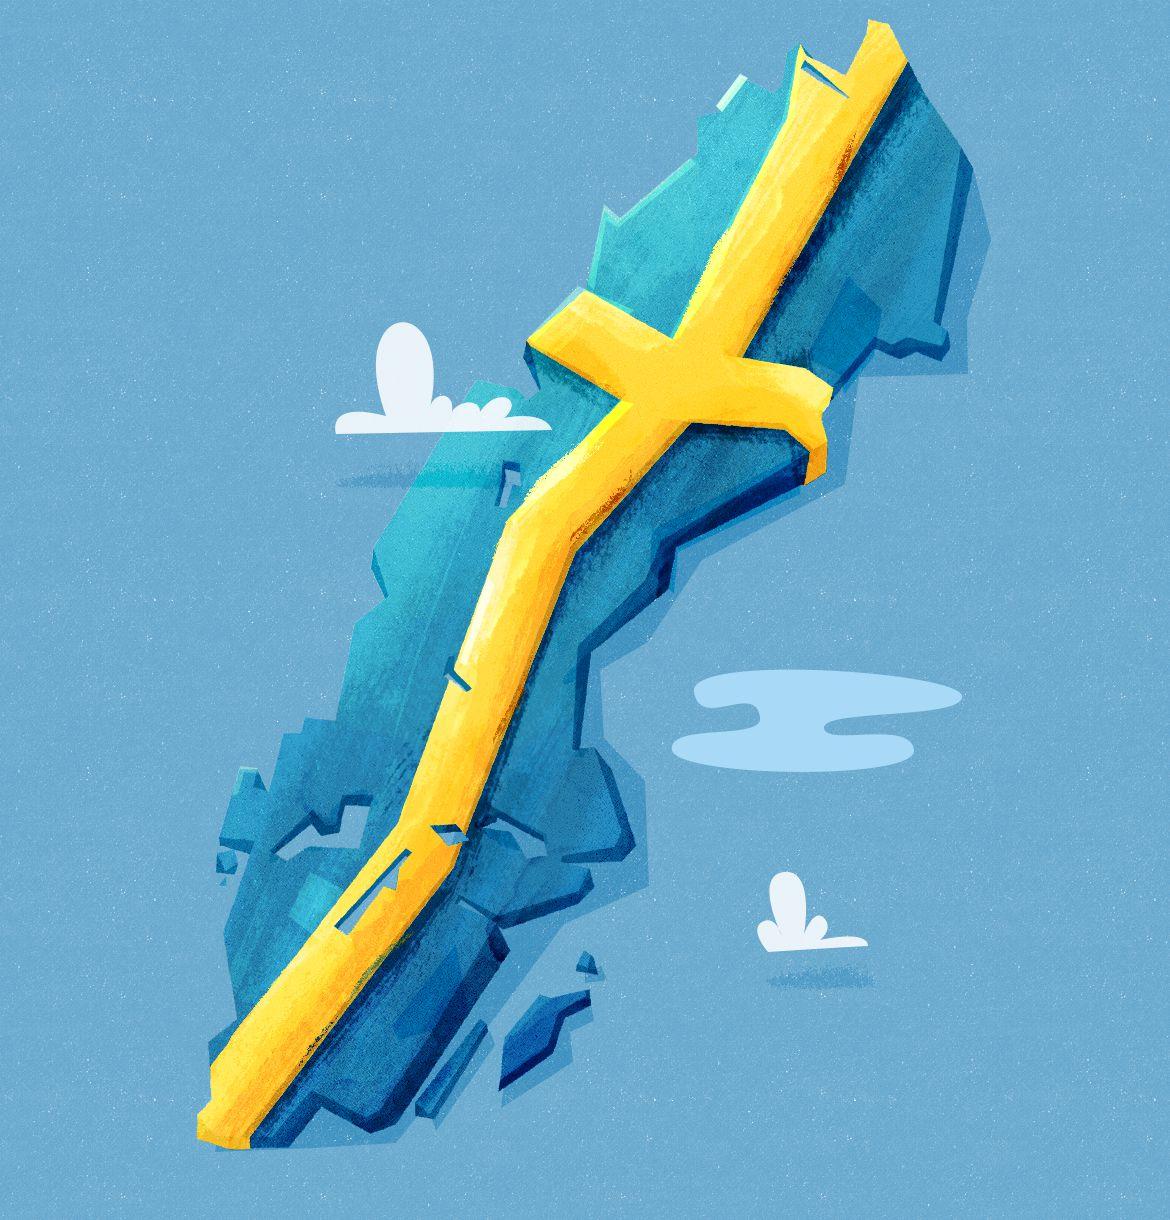 sweden@2x.jpg